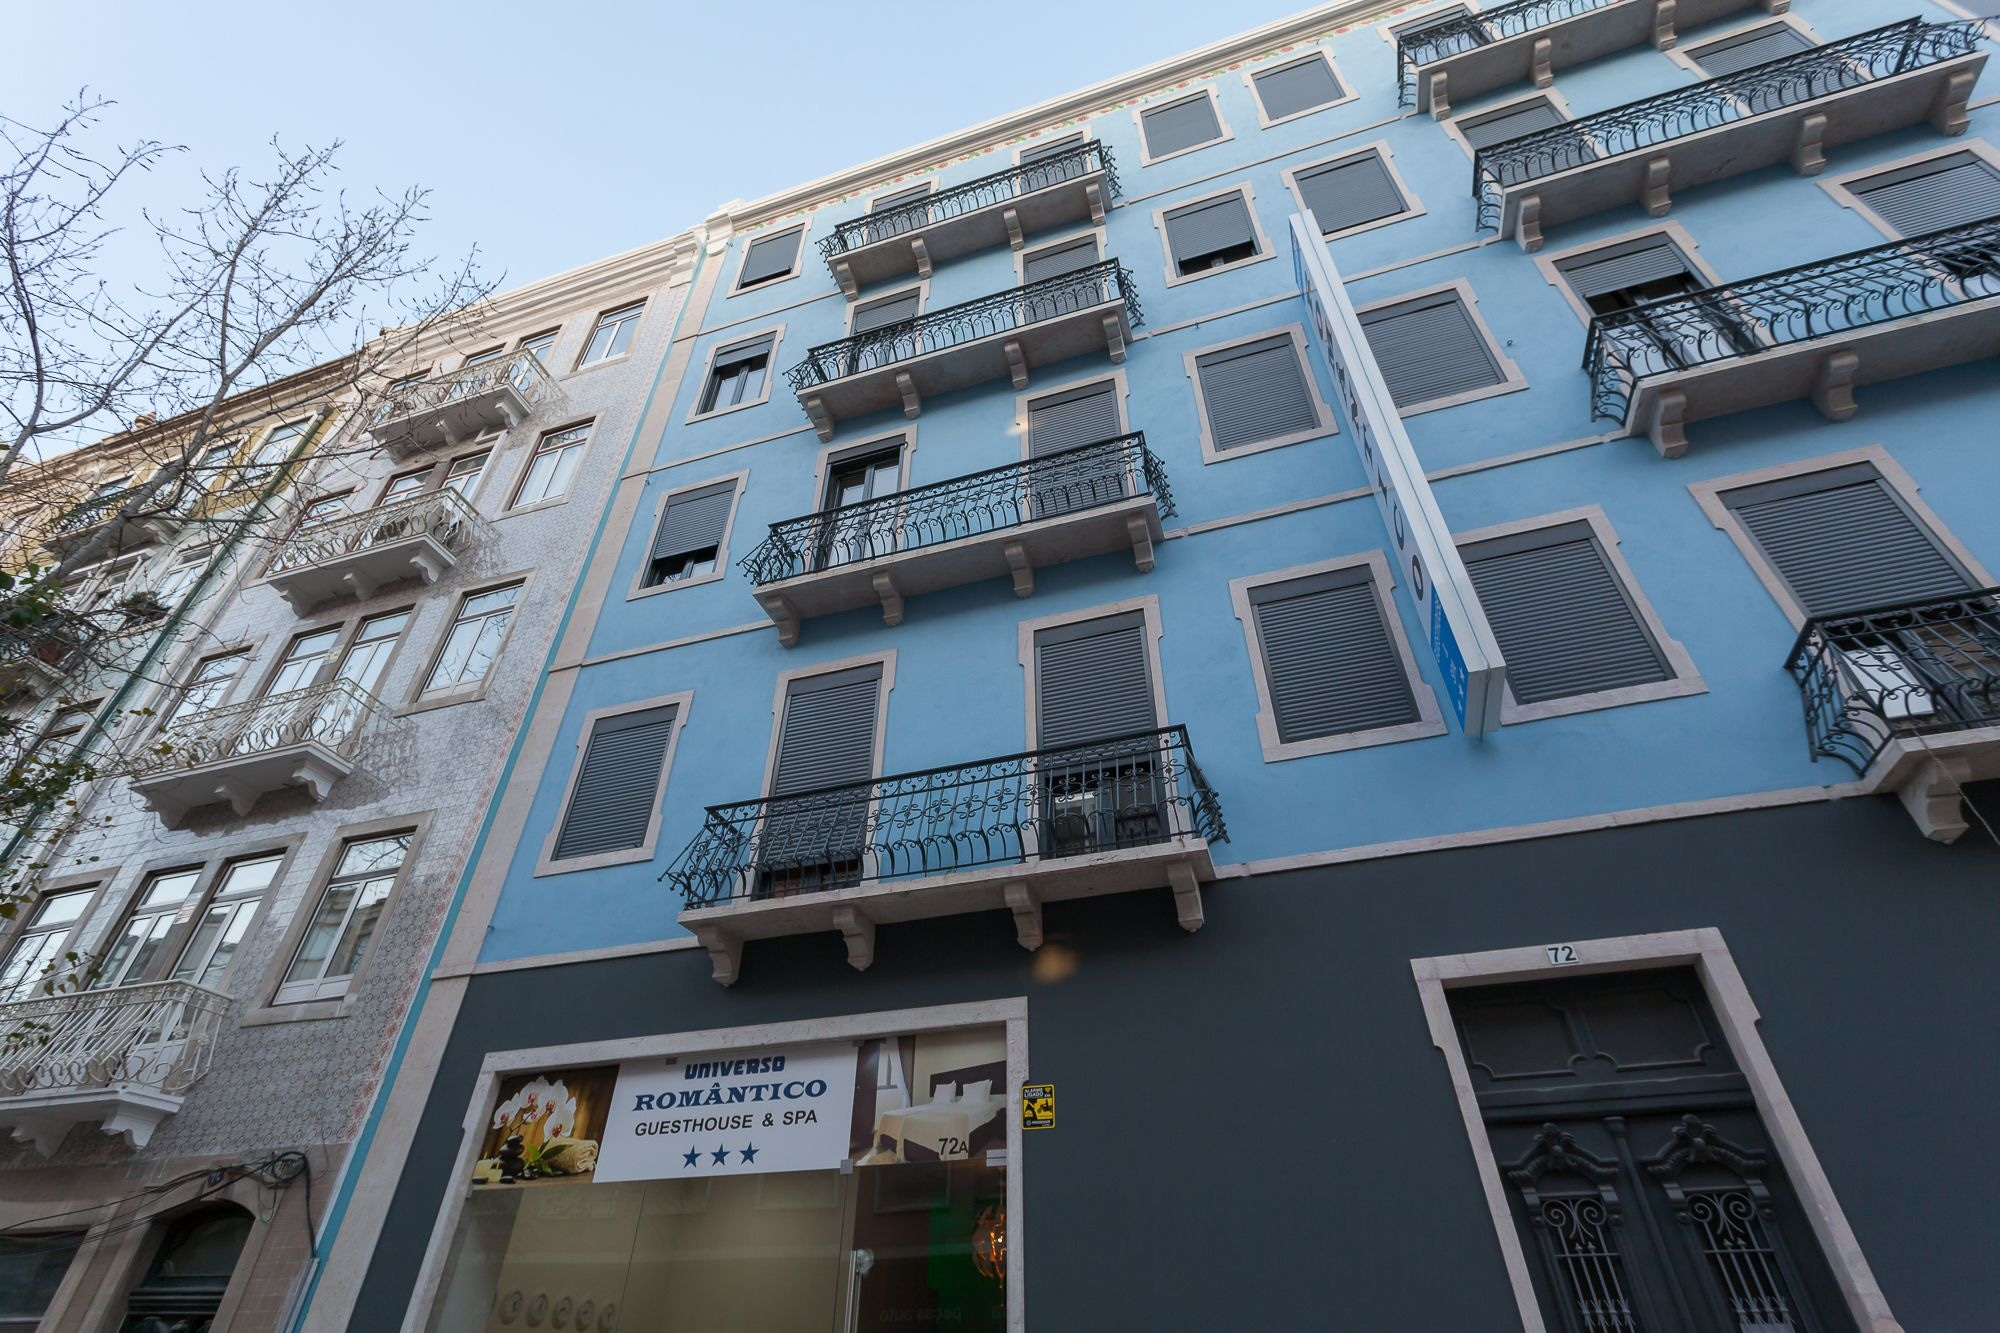 Universo Romântico Guesthouse & Spa, Lisboa